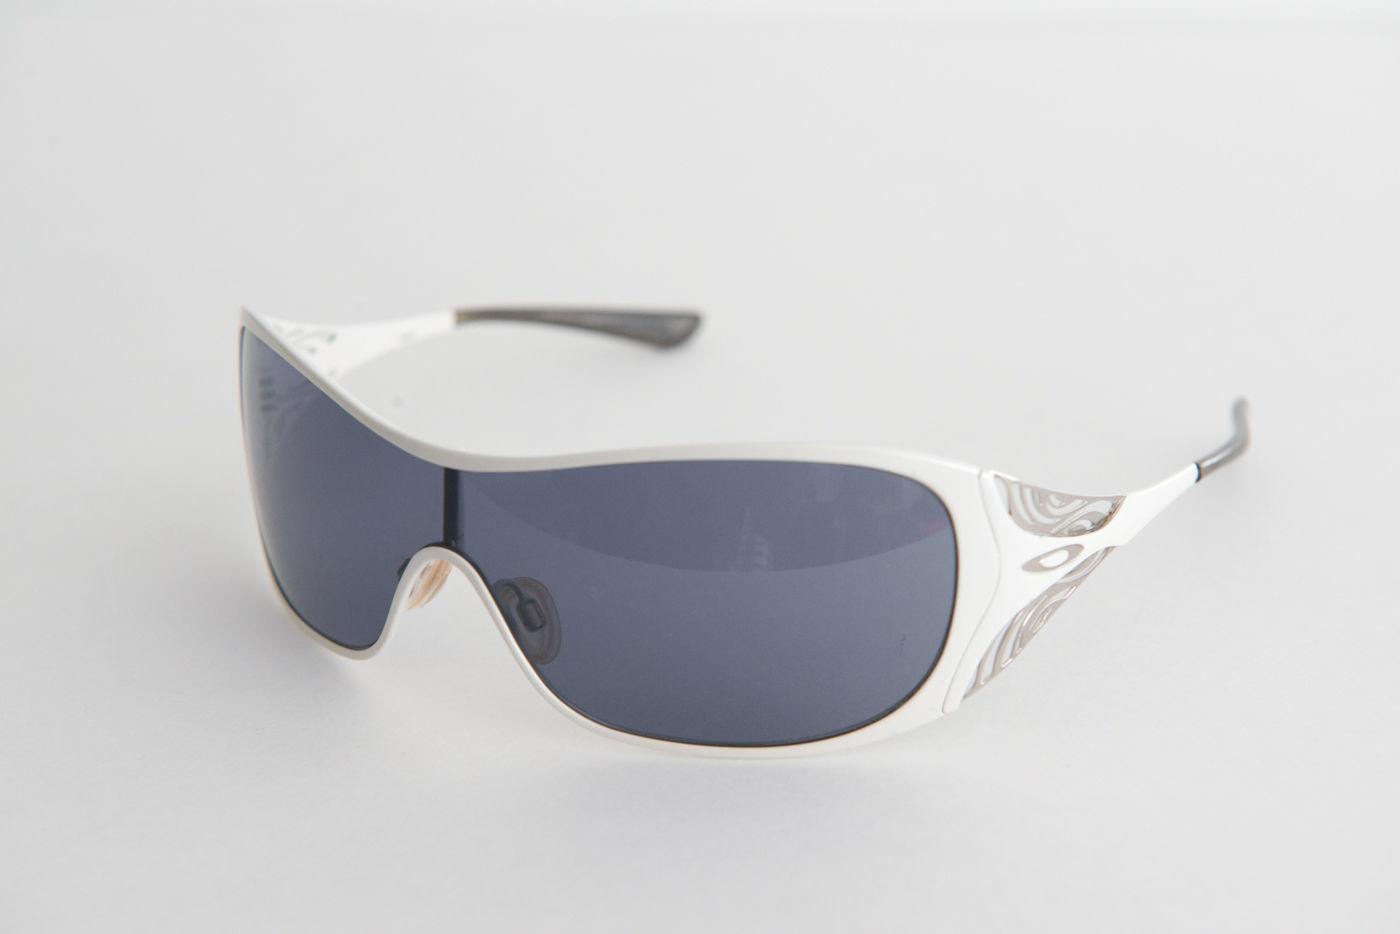 cheap oakley liv sunglasses  oakley liv 05671